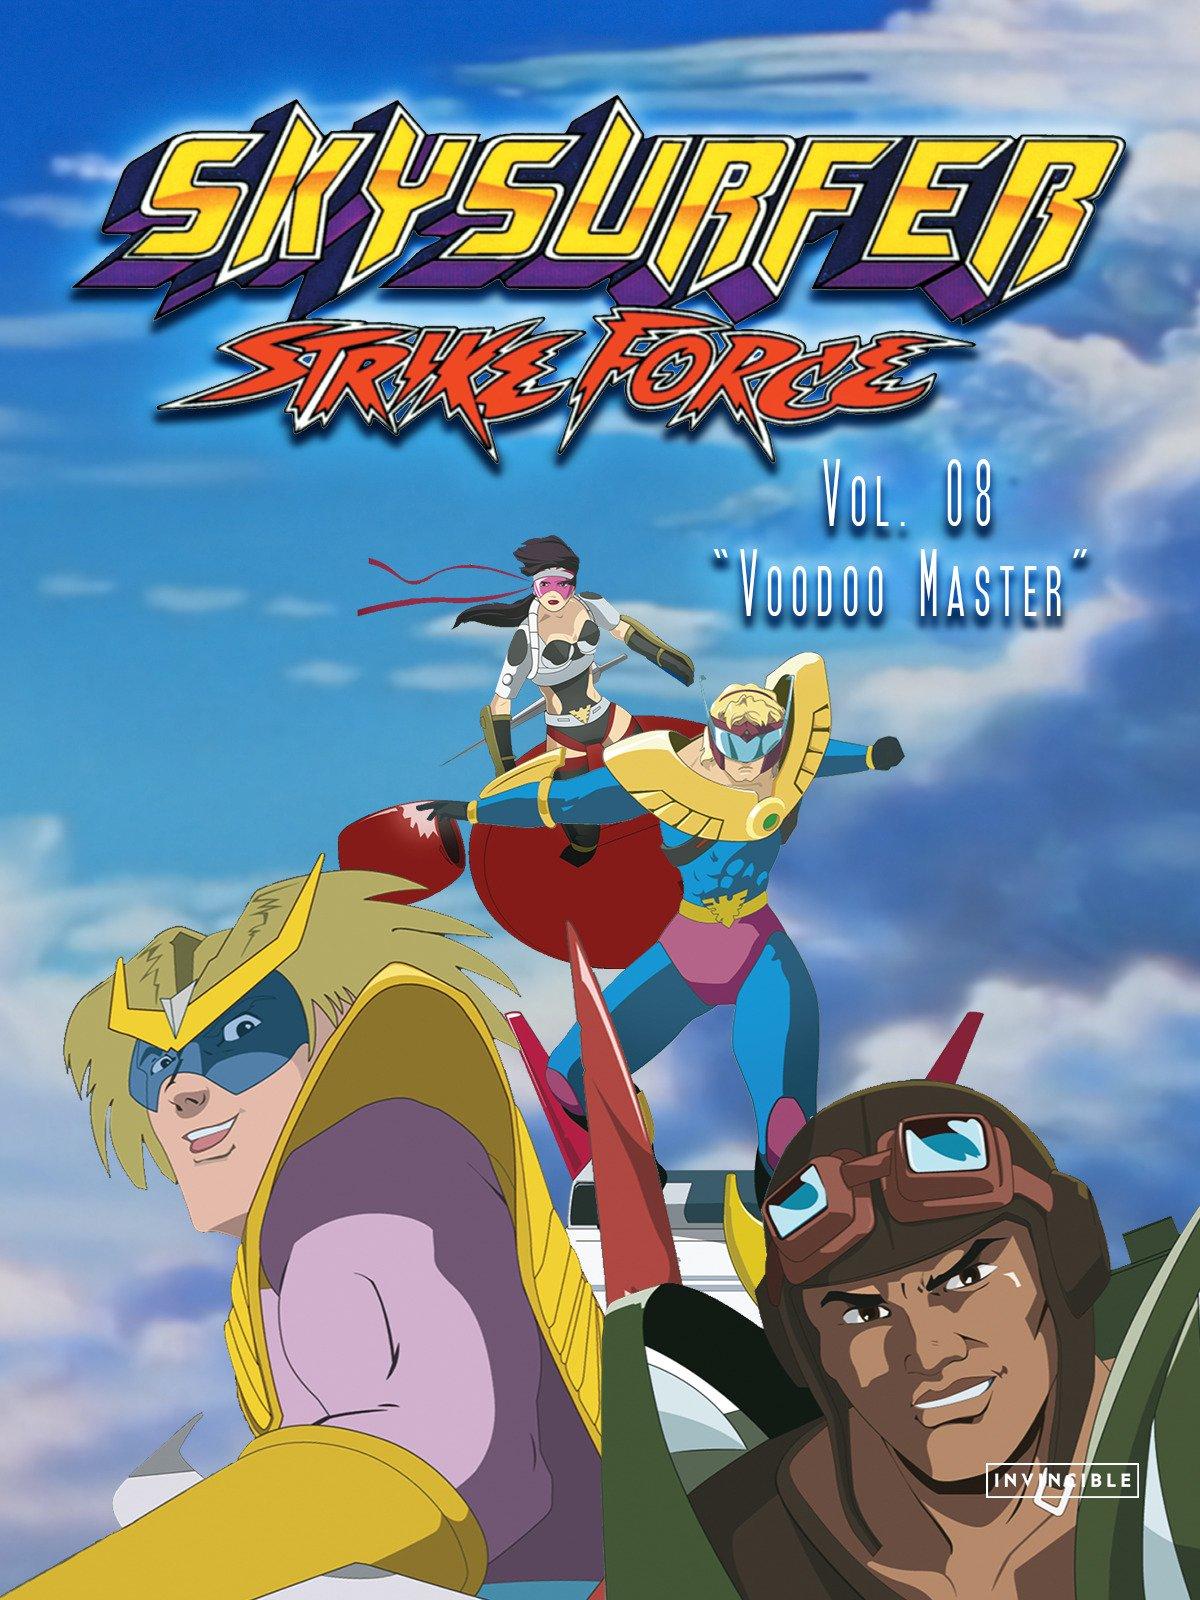 Skysurfer Strike Force Vol. 08Voodoo Master on Amazon Prime Video UK